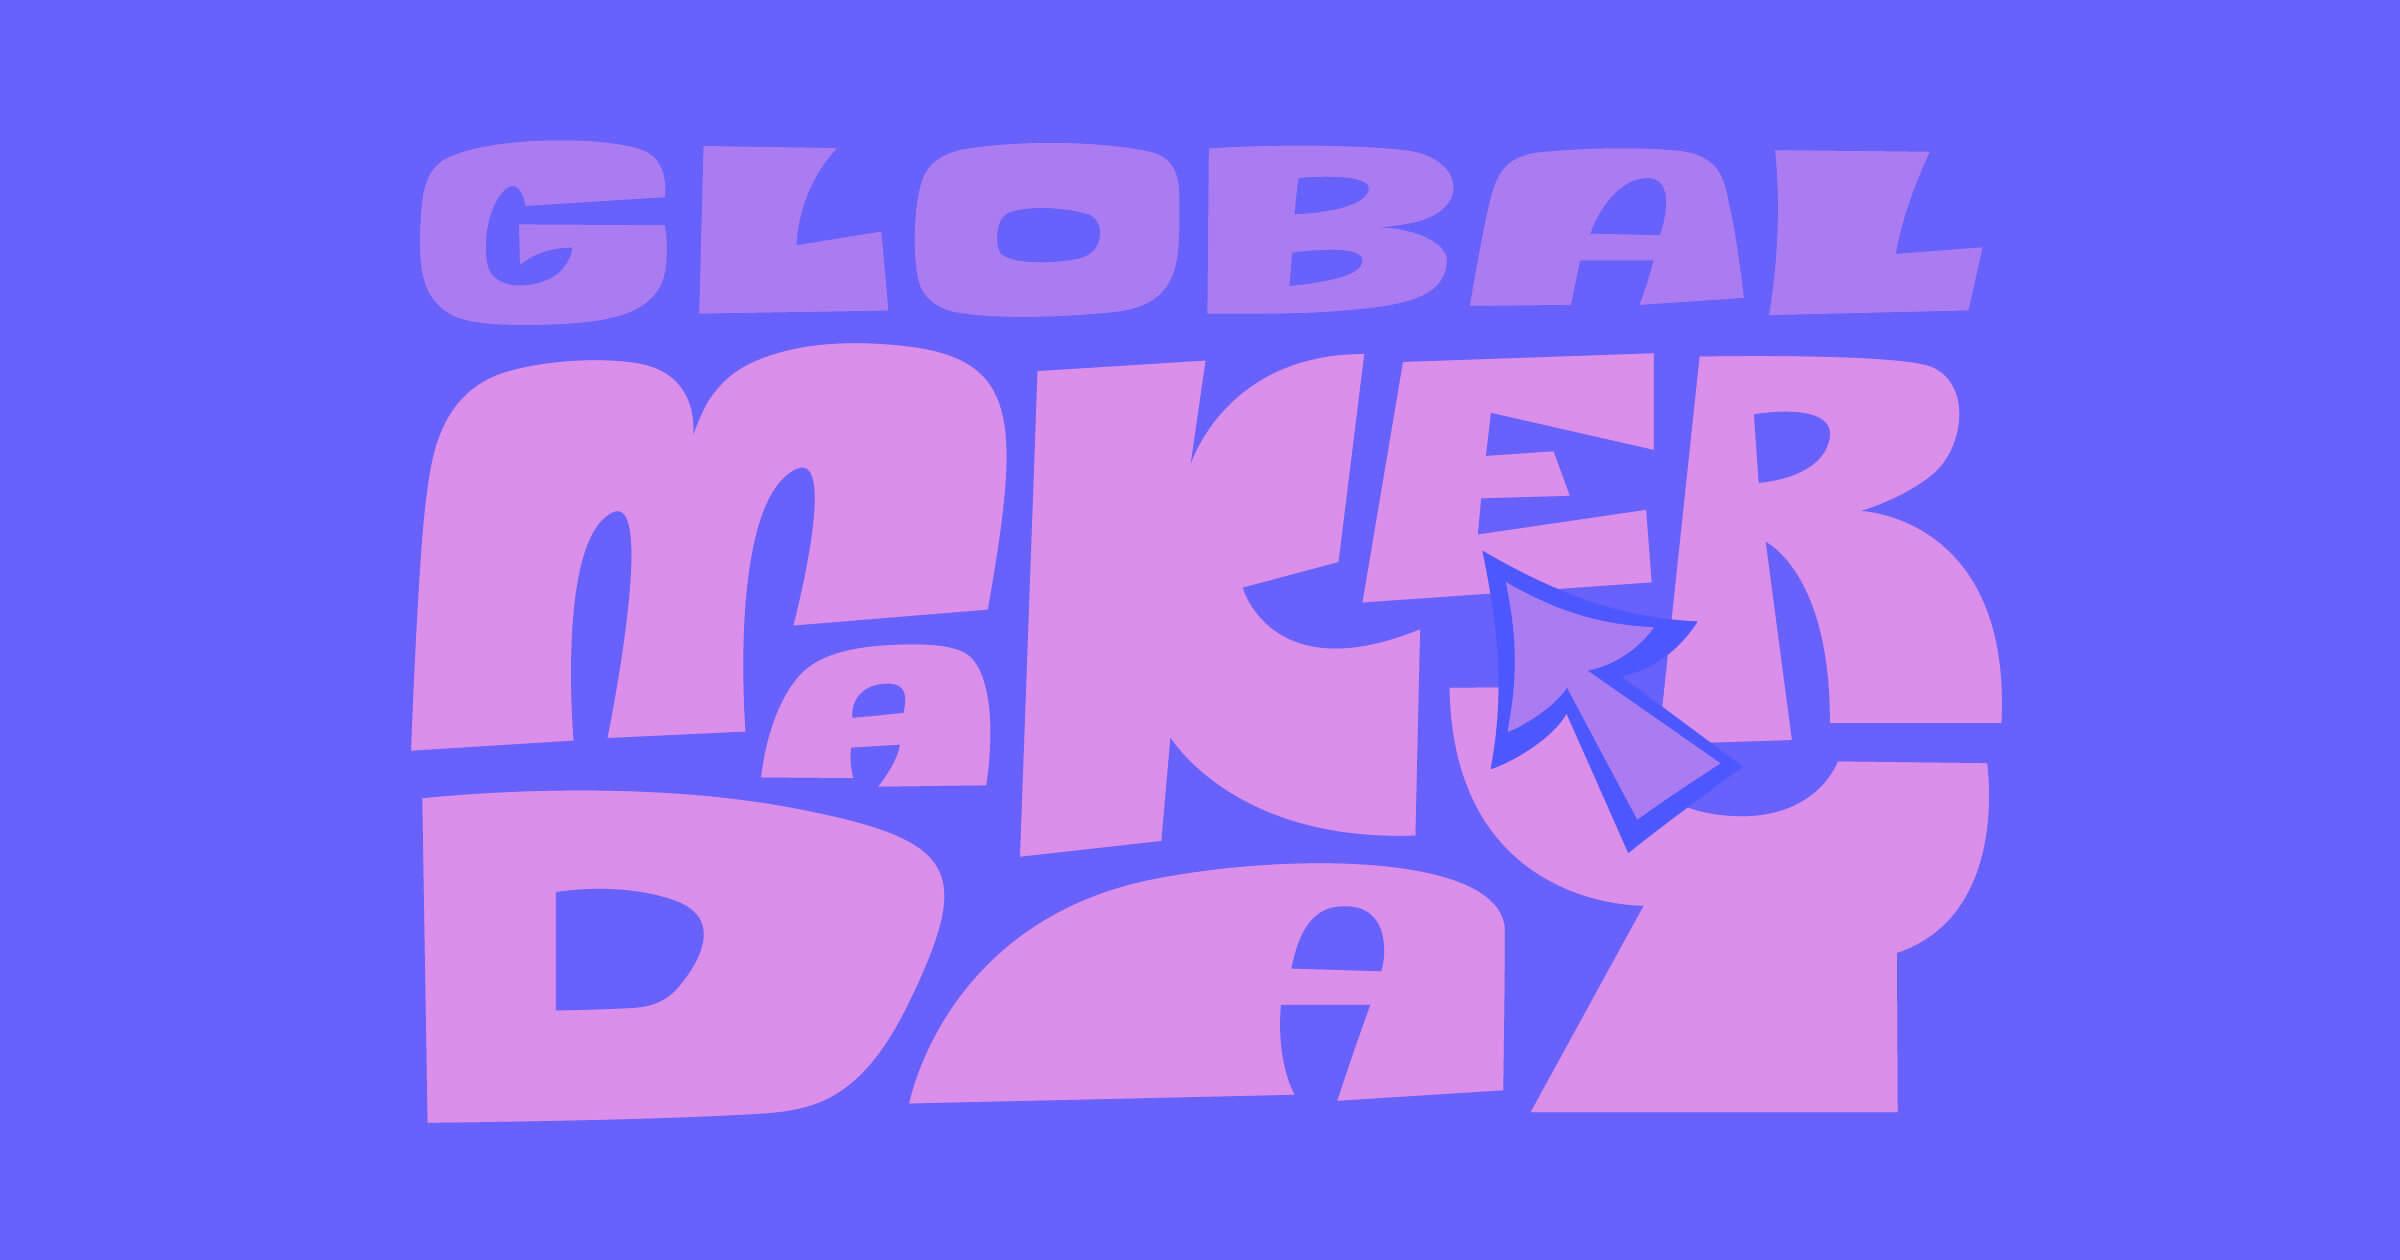 Announcing Webflow Virtual World Tour 2020 Global Maker Day